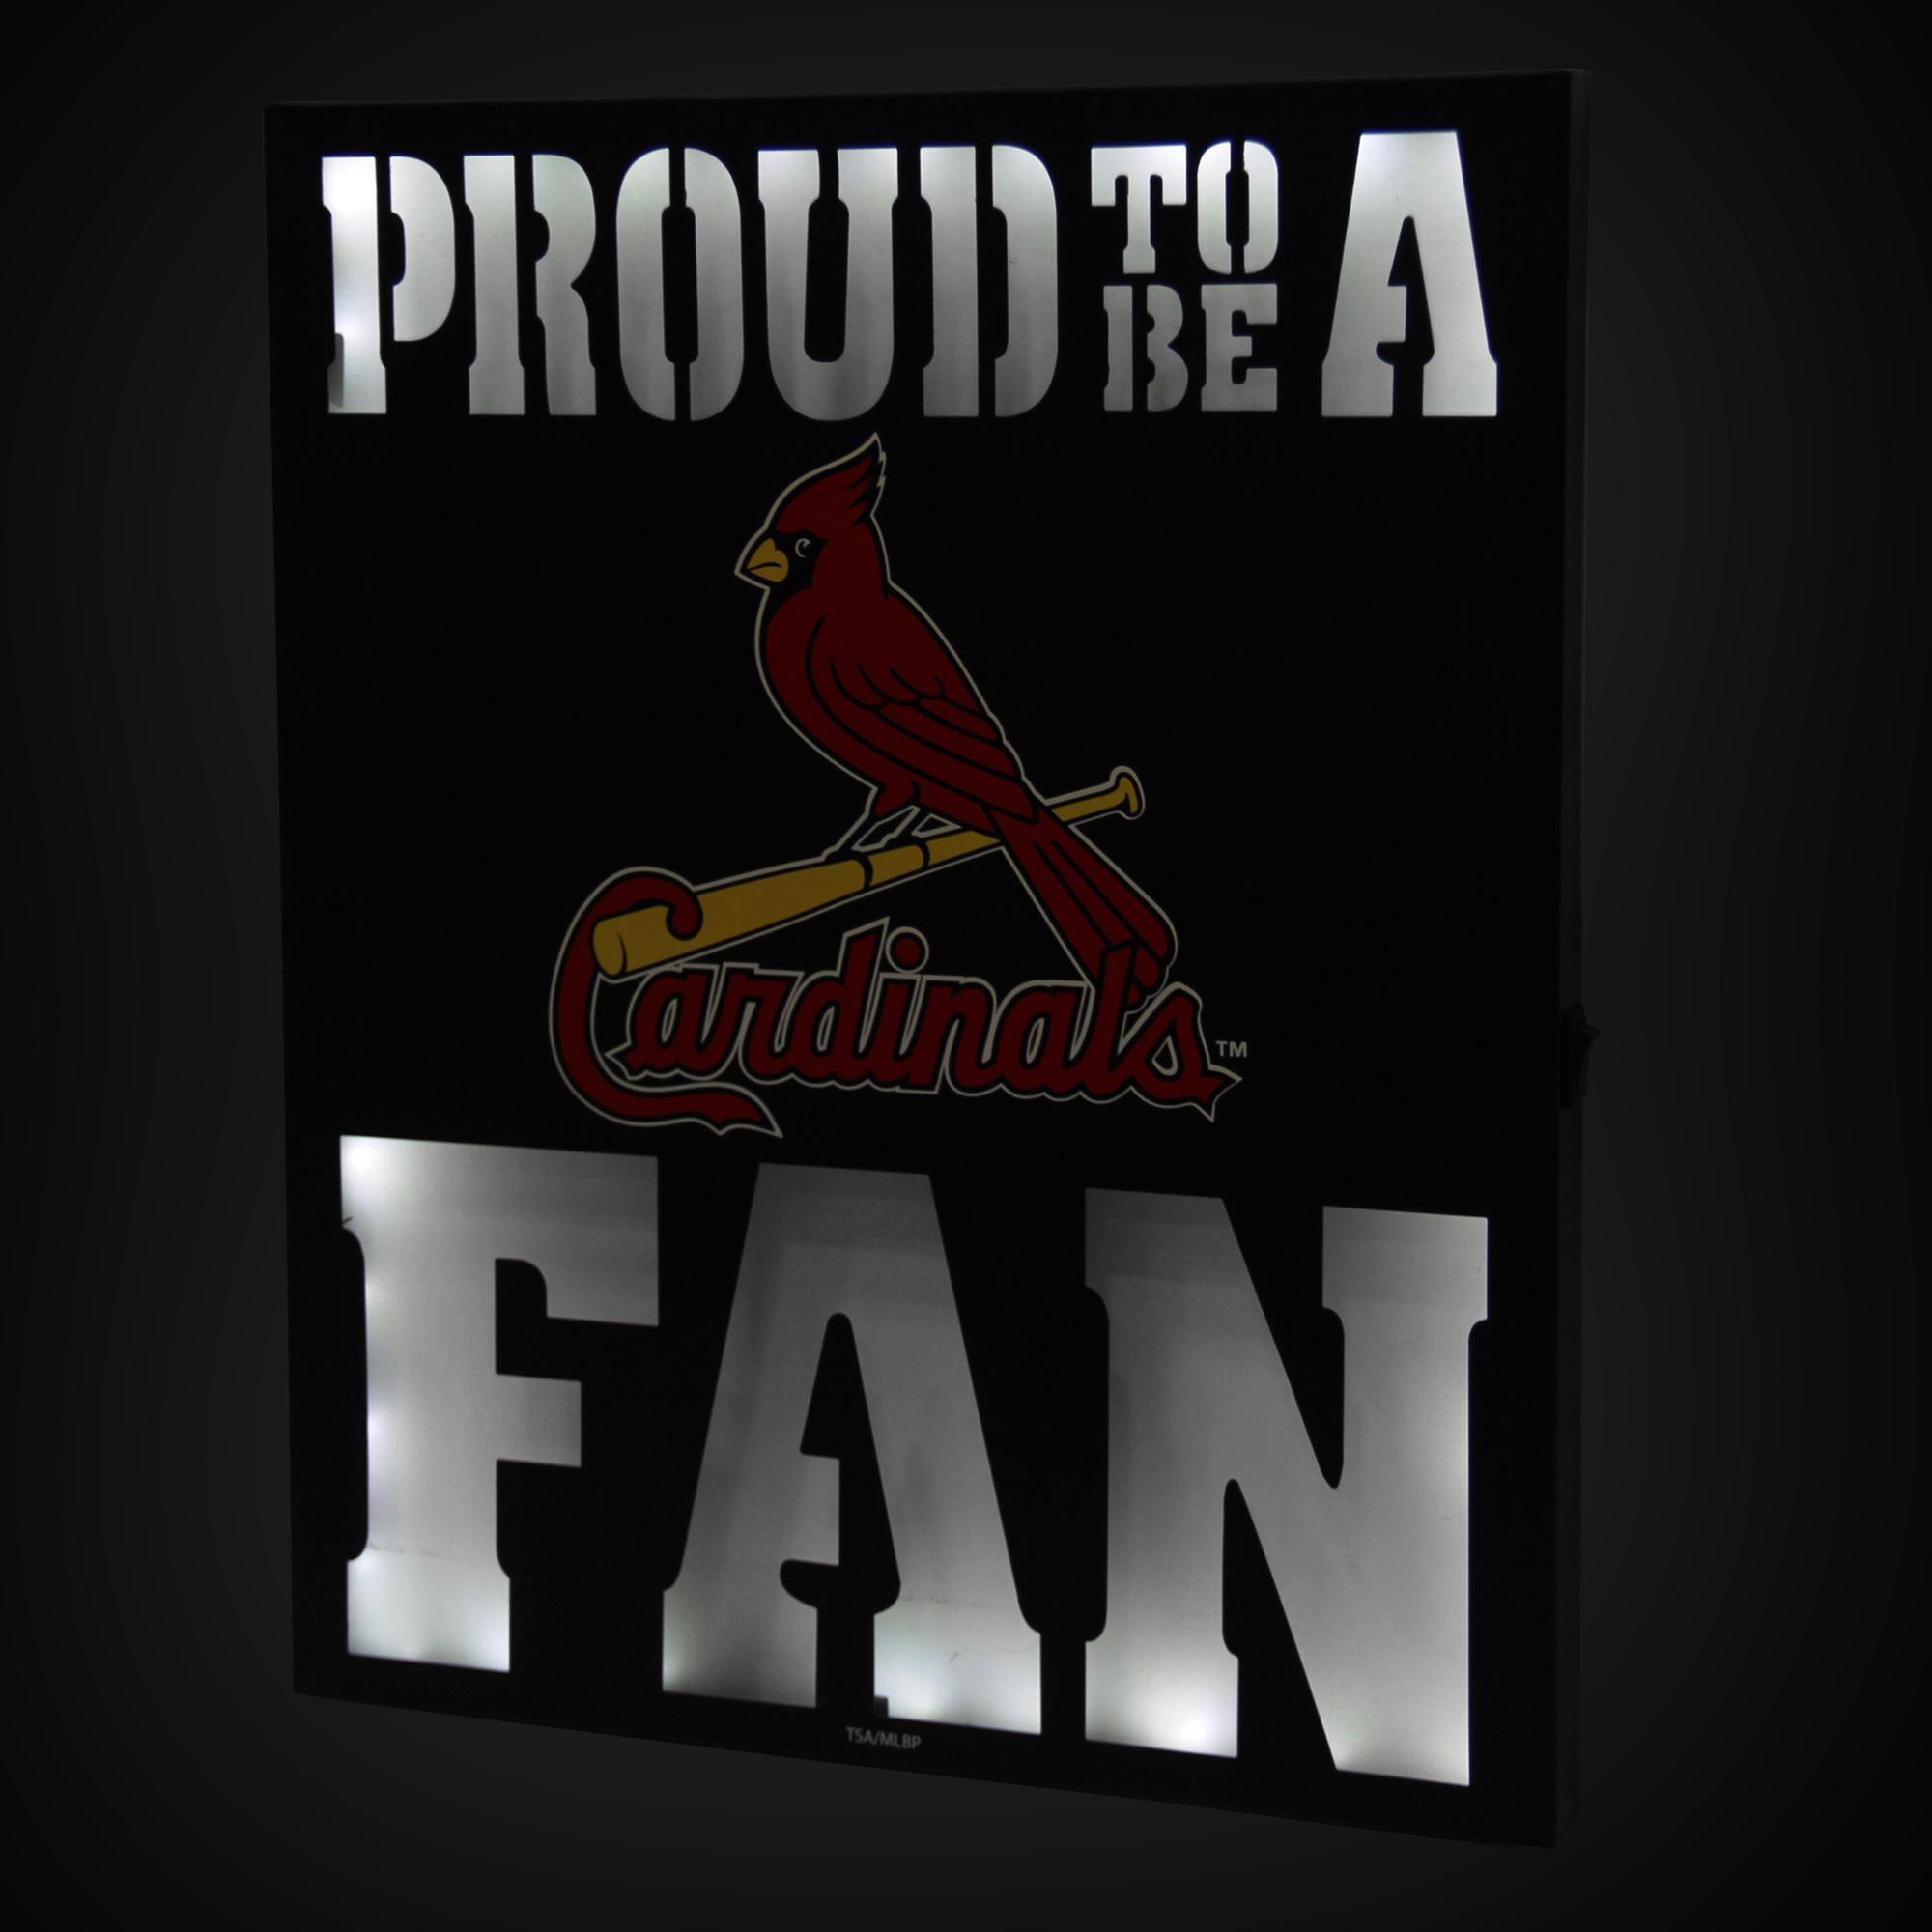 "St. Louis Cardinals 12"" x 15"" LED Metal Wall Decor - No Size"